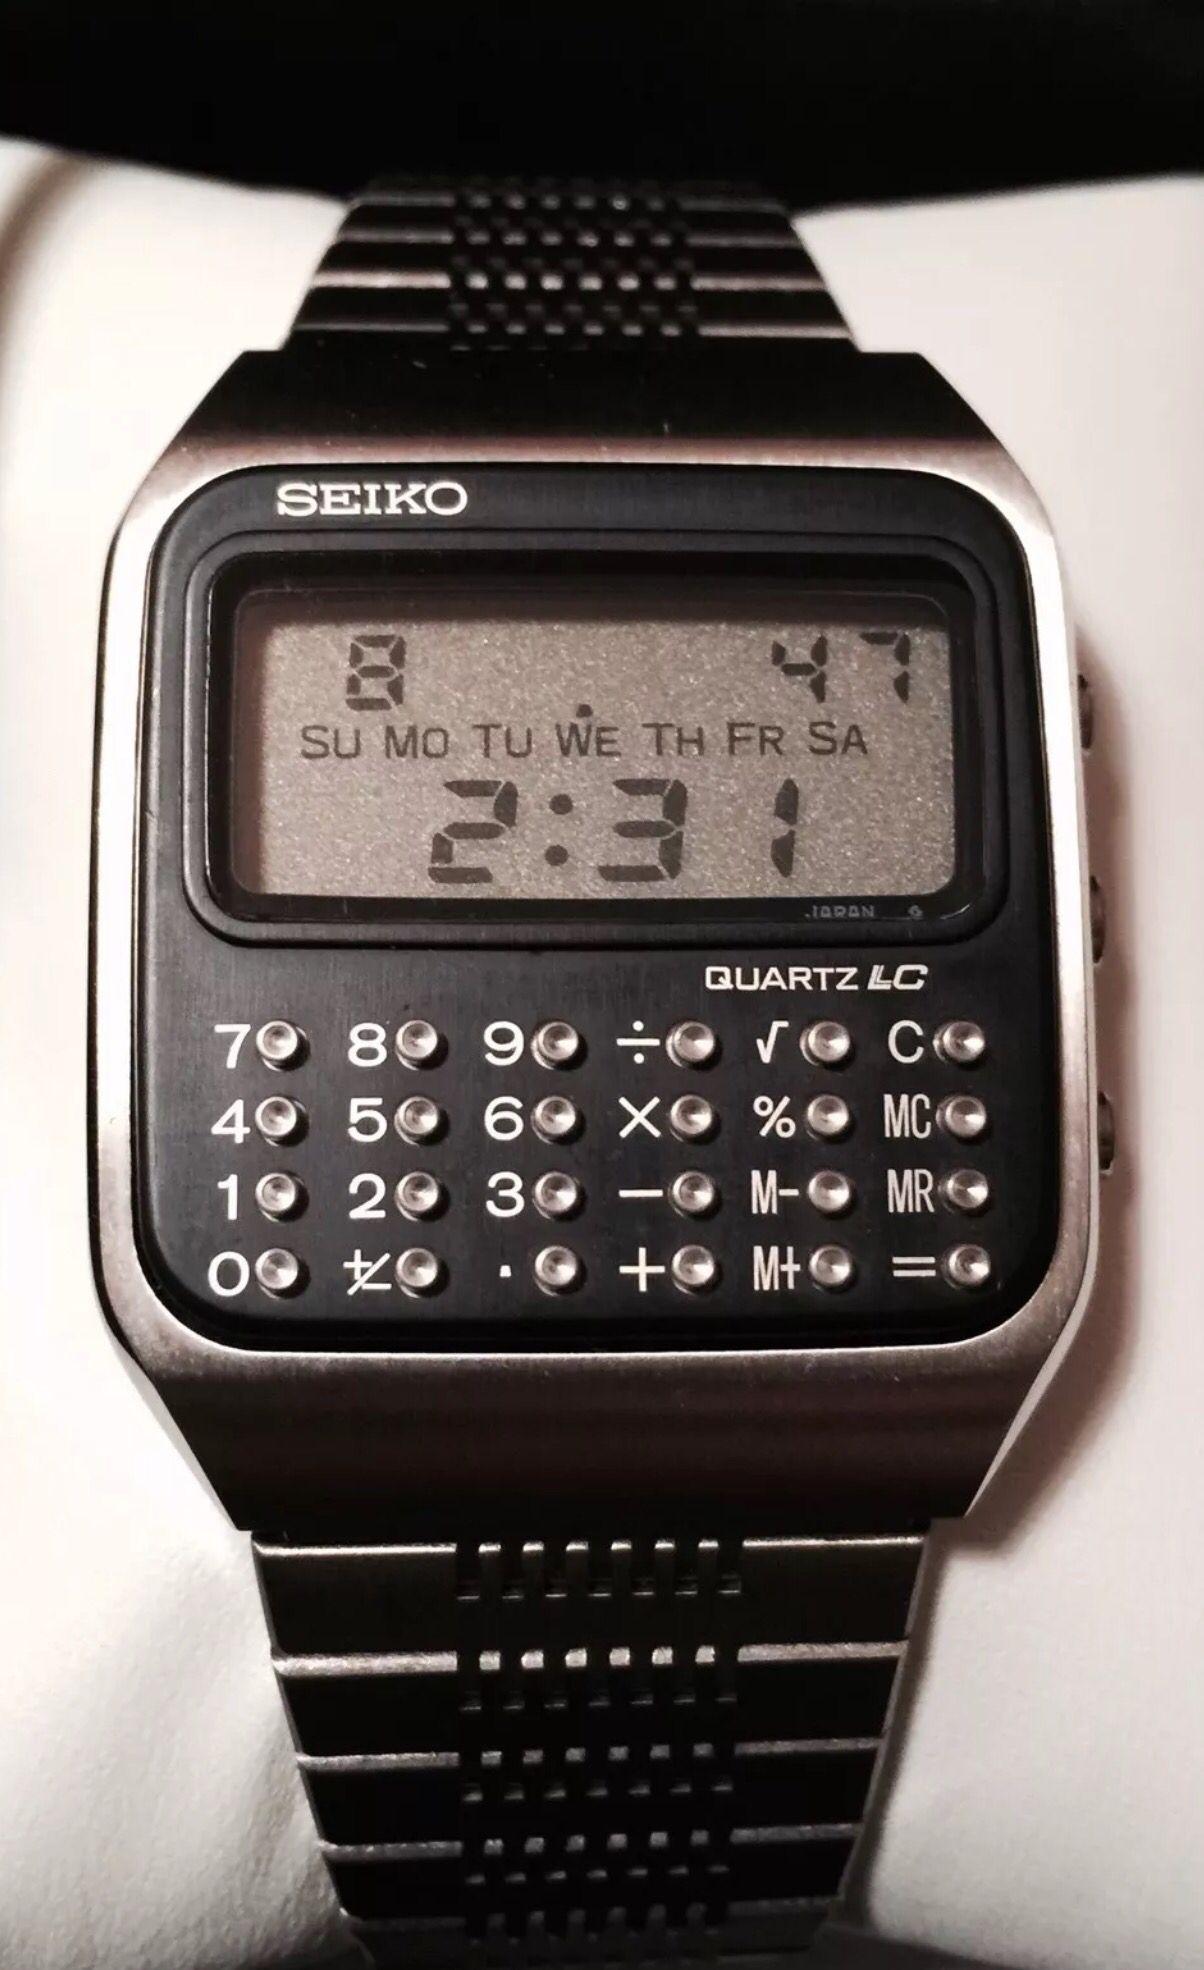 95c8b611192 Seiko C-153 1978 calculator watch